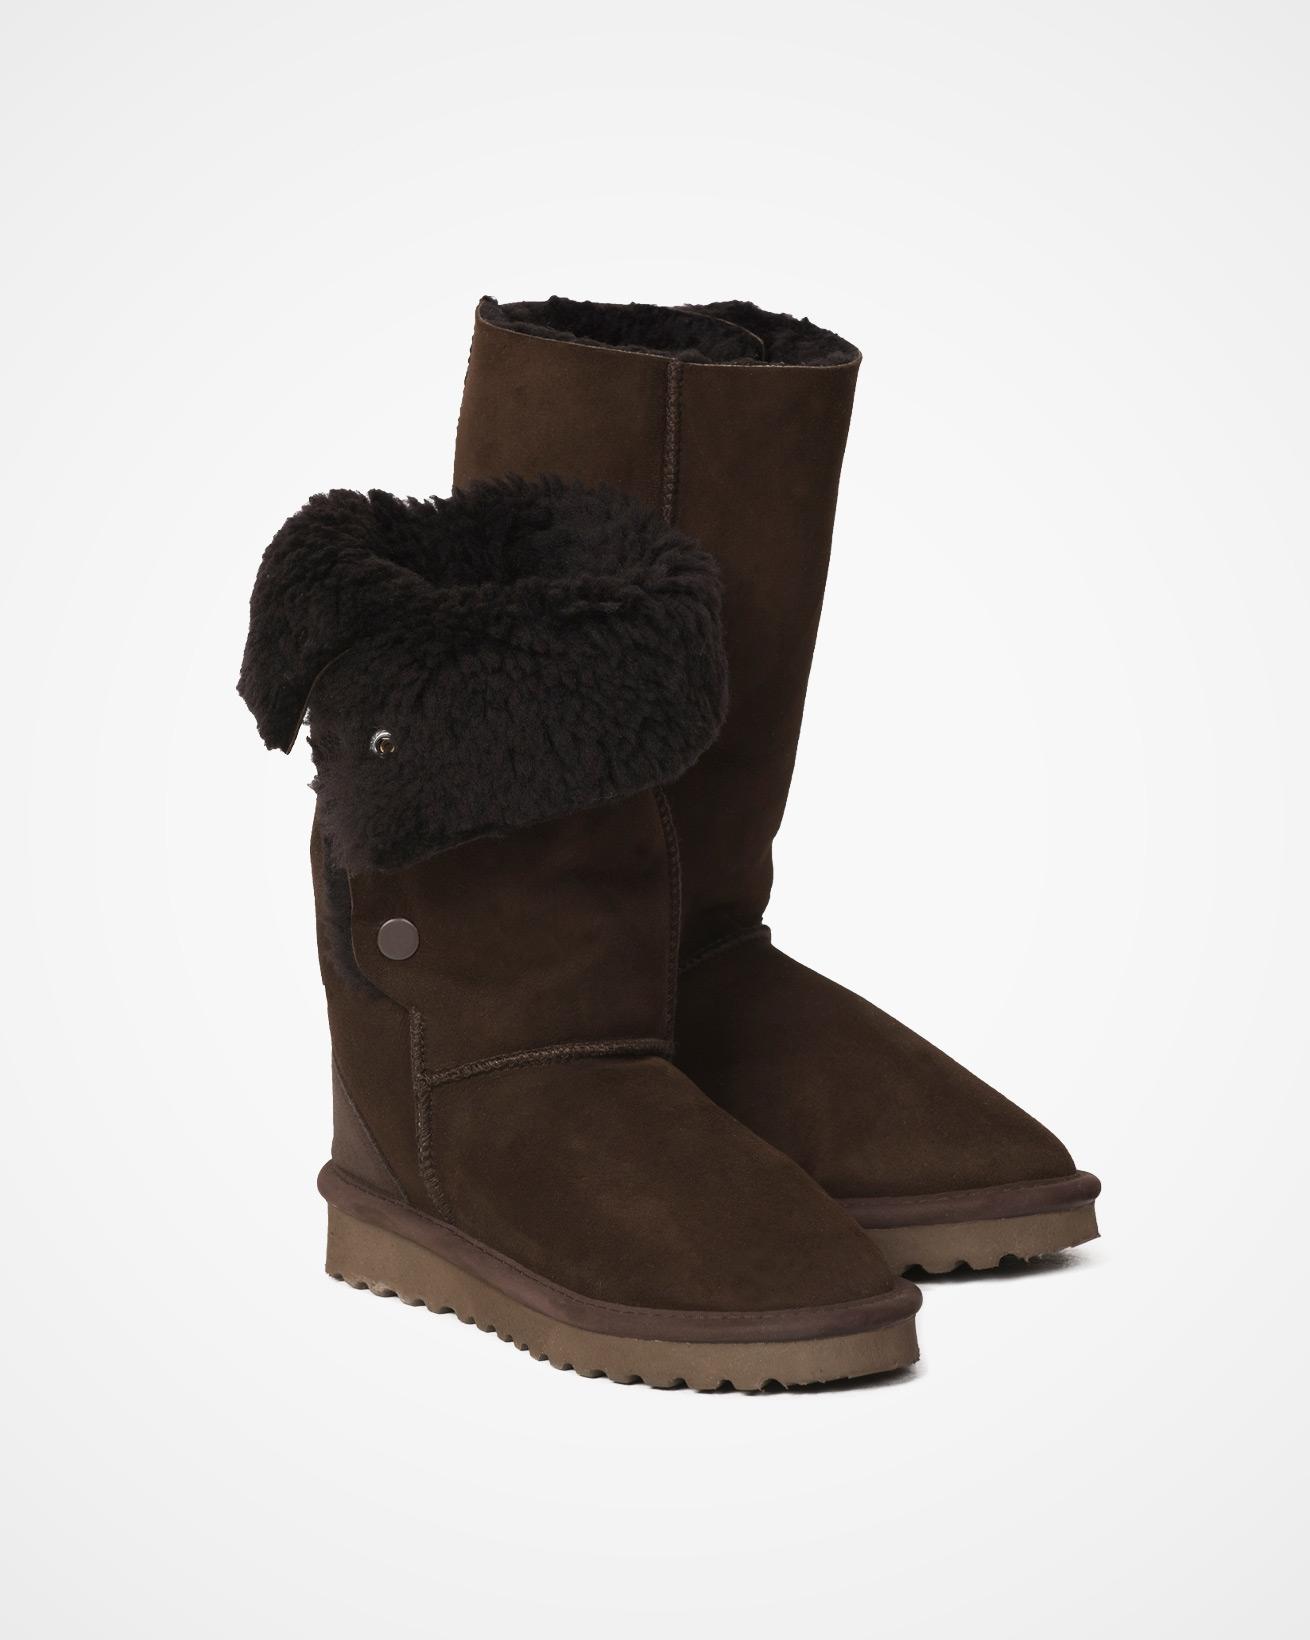 2007_popper-boots-calf-height_mocca_pair.jpg